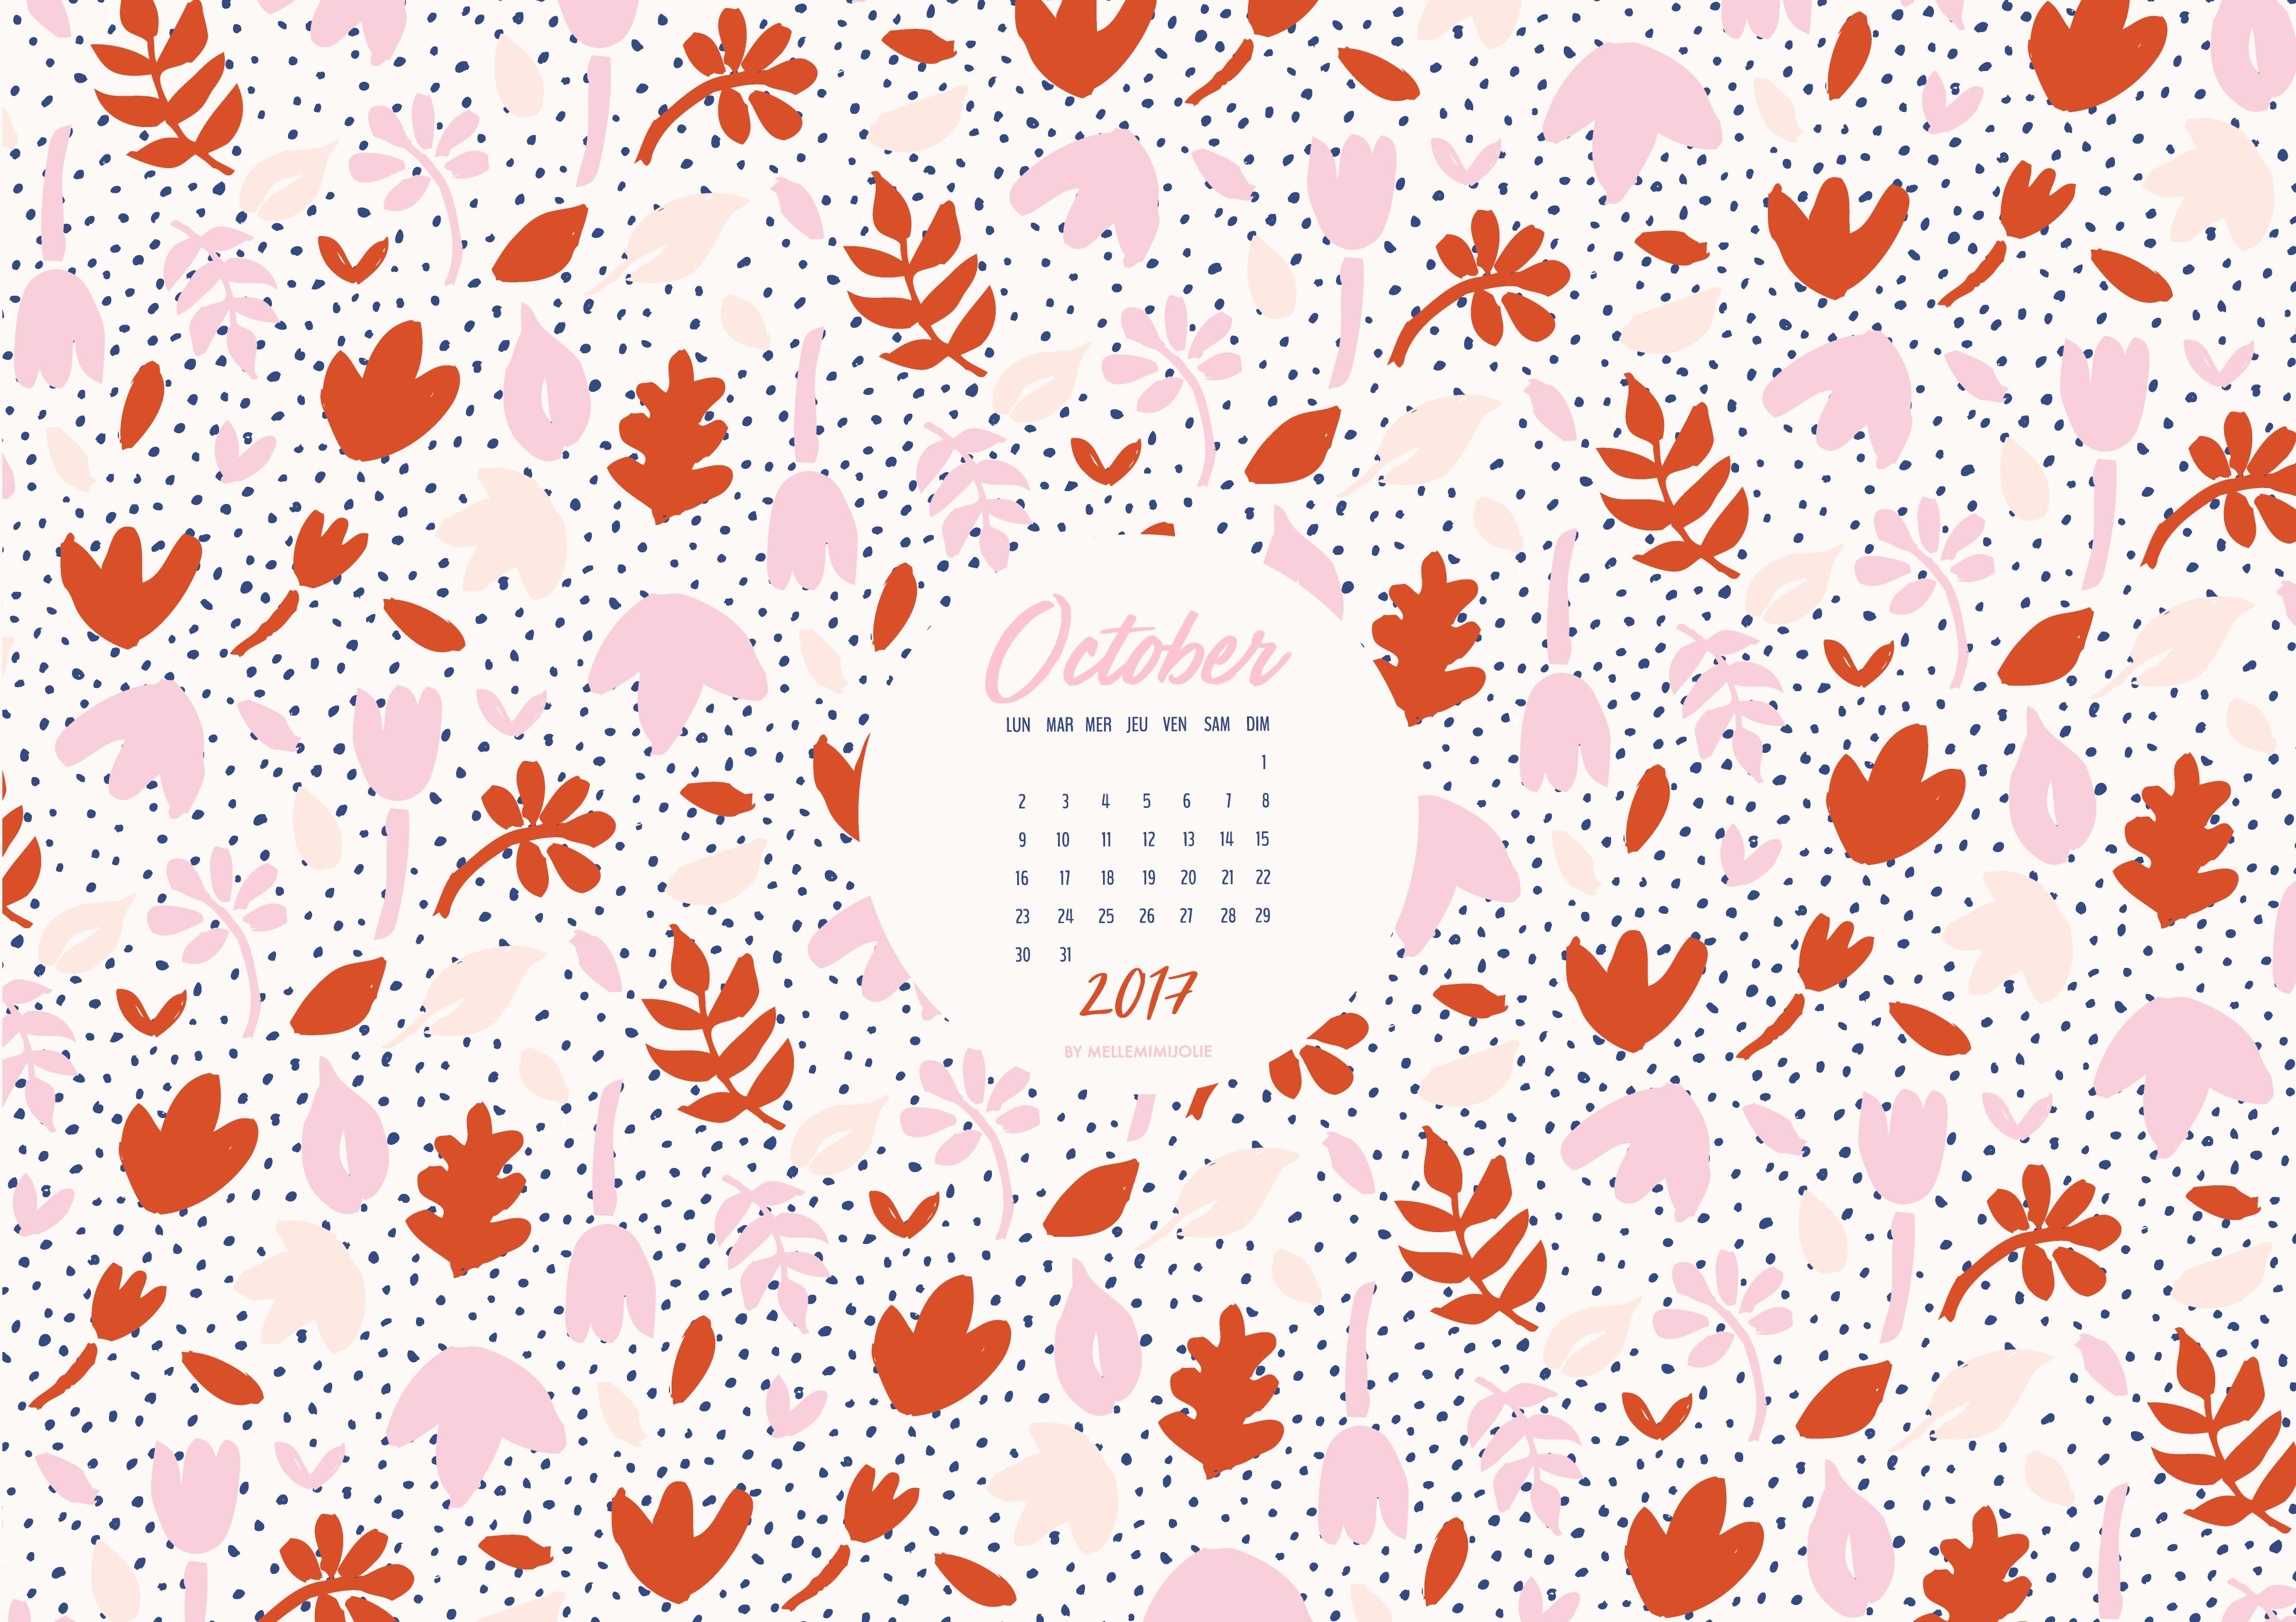 mellemimijolie-autumn-octobre